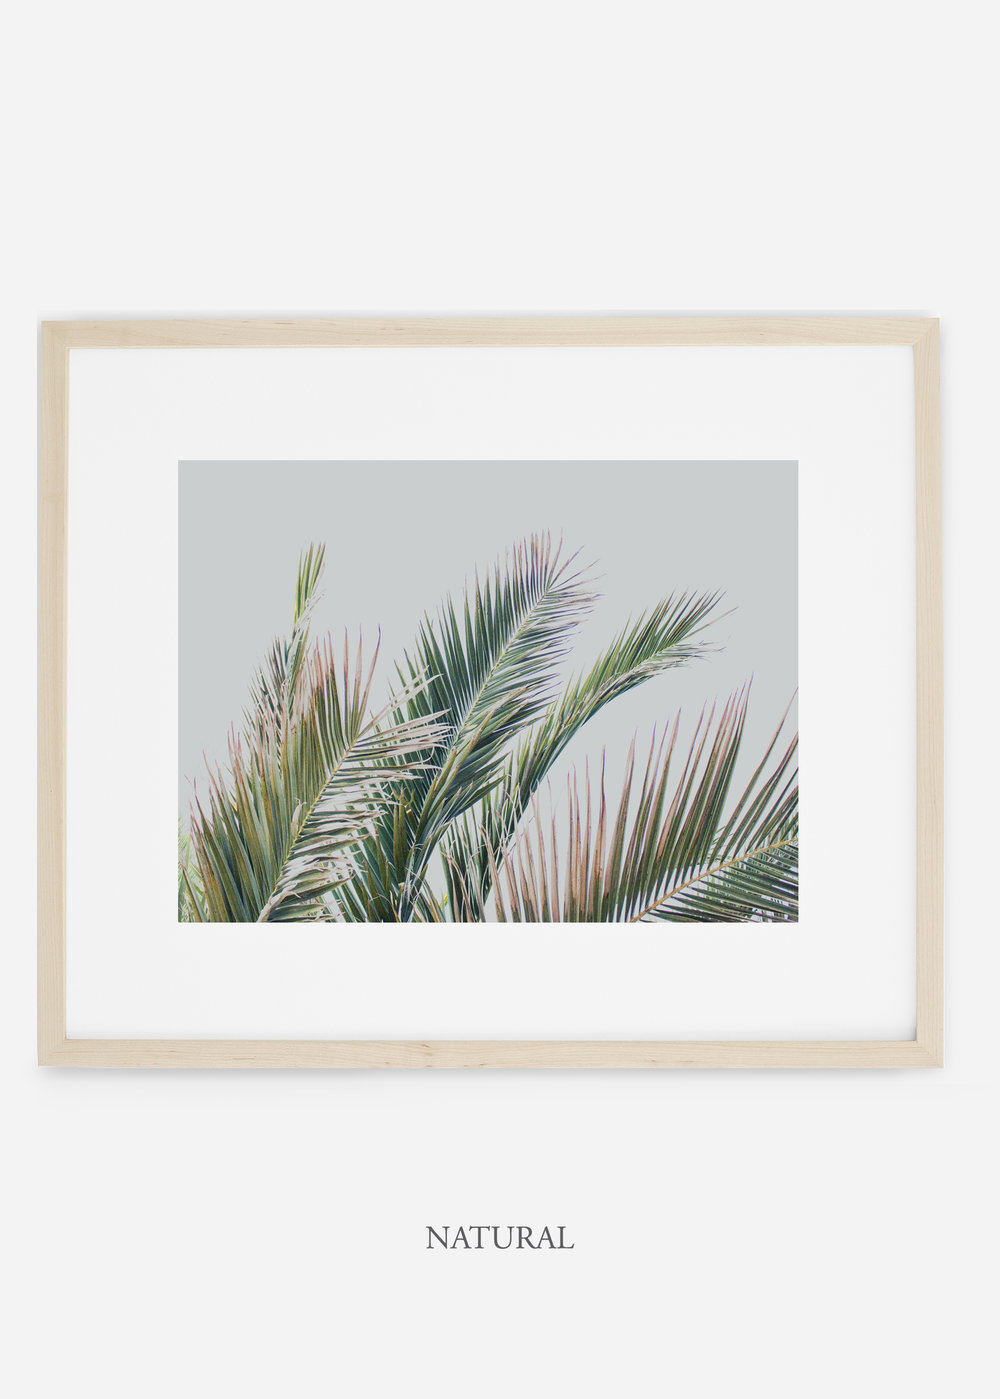 interiordesign_naturalframe_art_tropical_palmtree_StormyGrayPalm.jpg